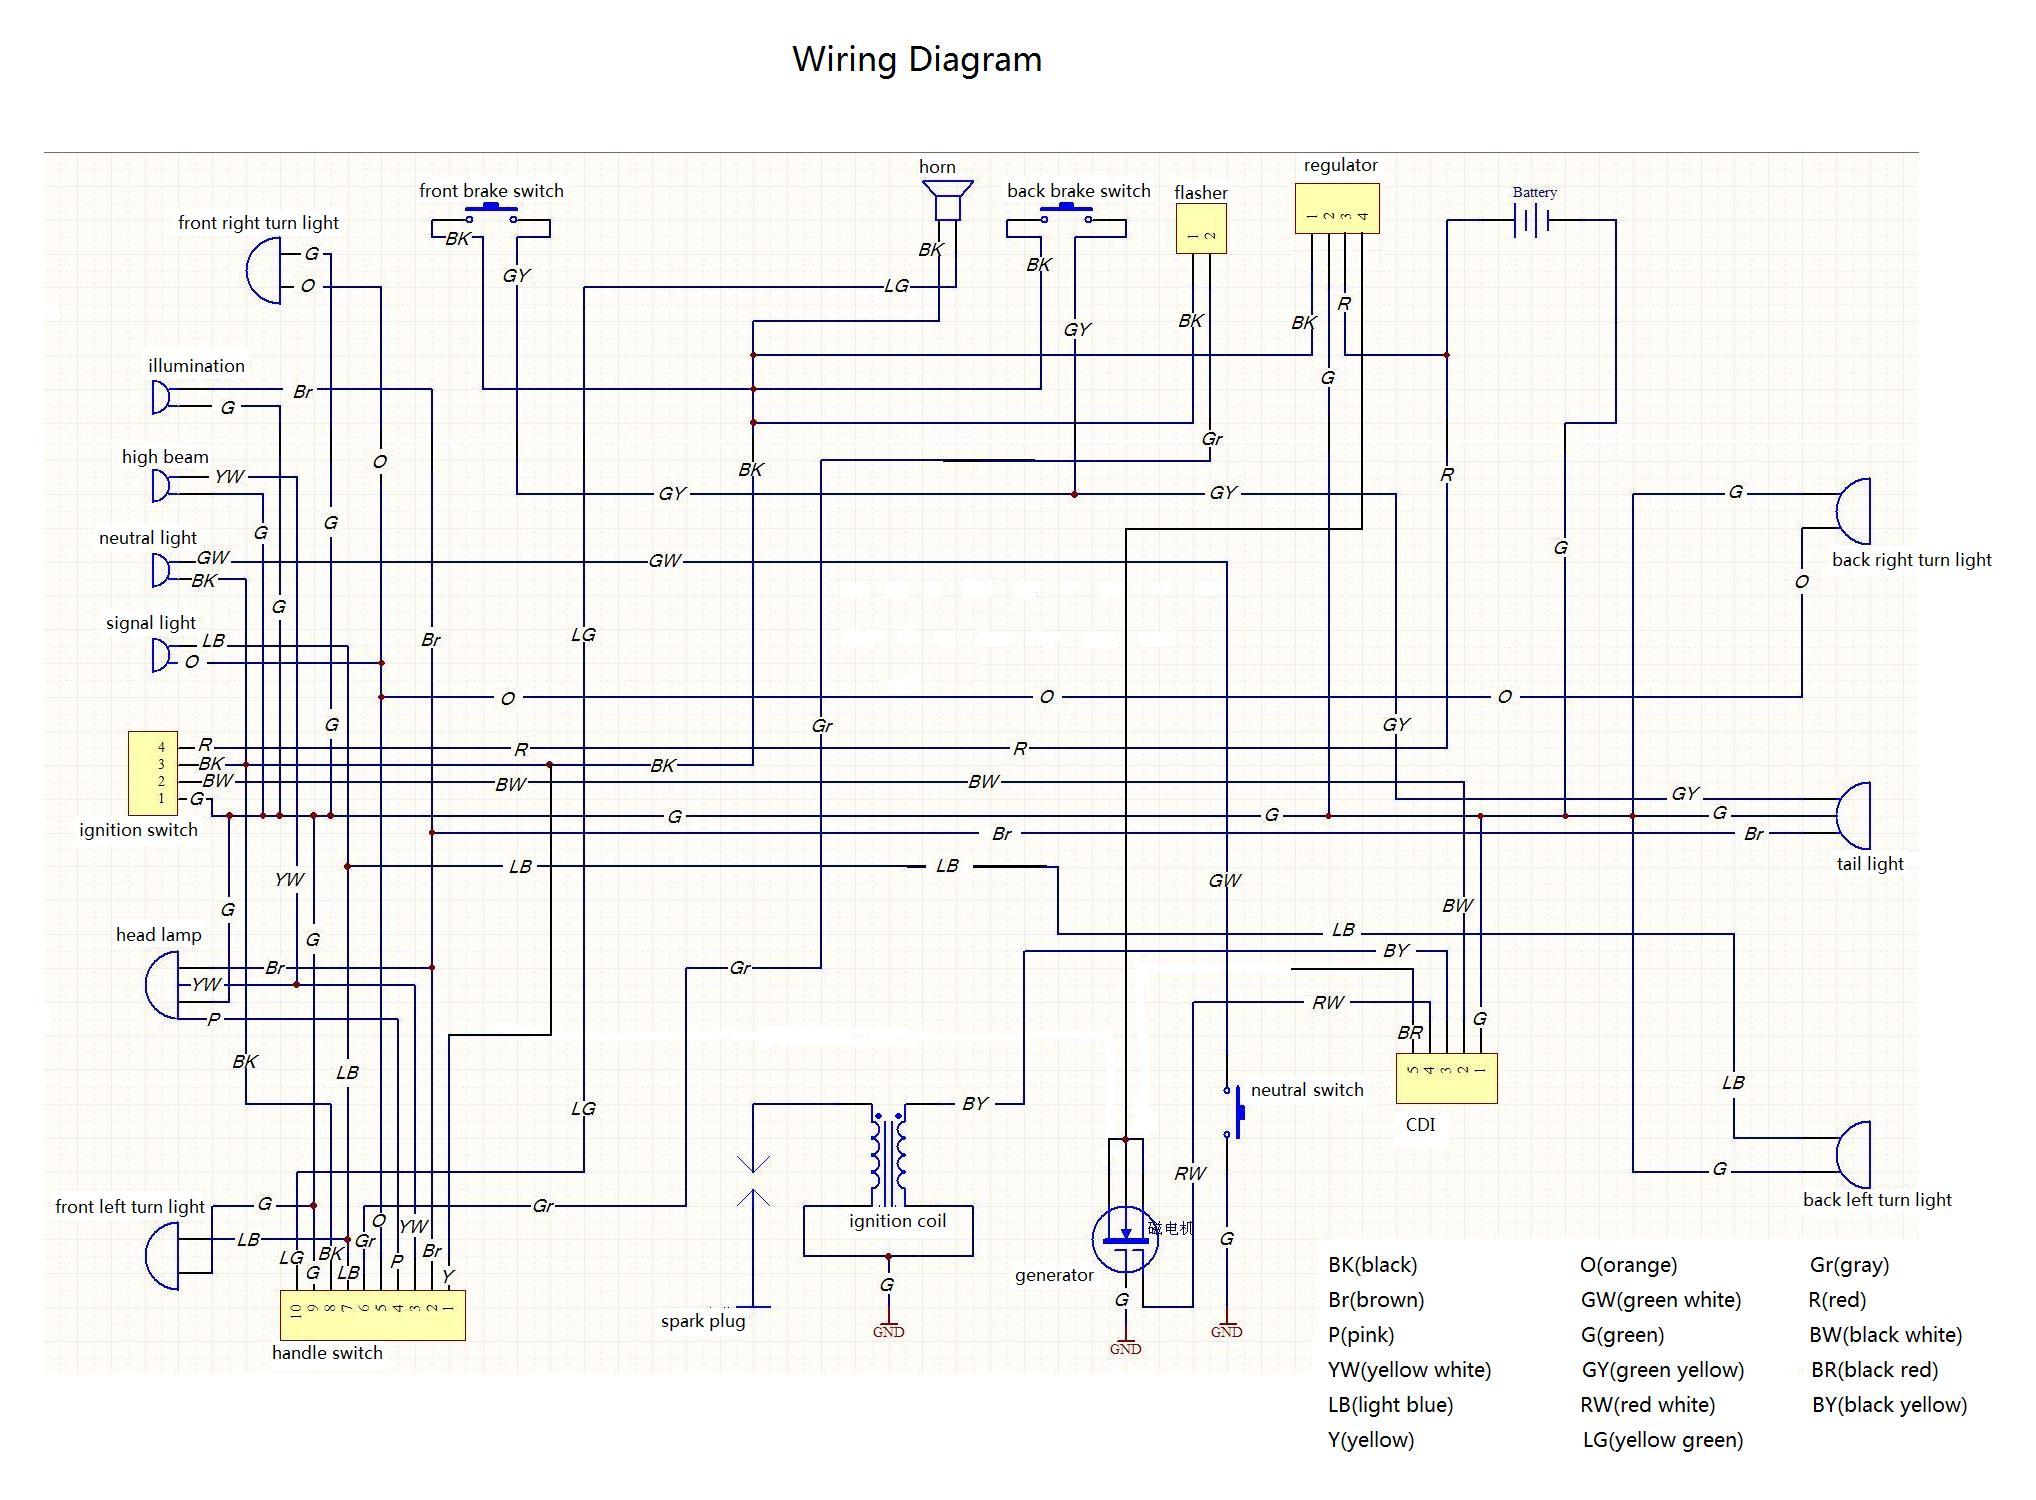 OORacing_HD_Loom?resize=665%2C490&ssl=1 pit bike wiring loom diagram wiring diagram pit bike wiring loom diagram at crackthecode.co